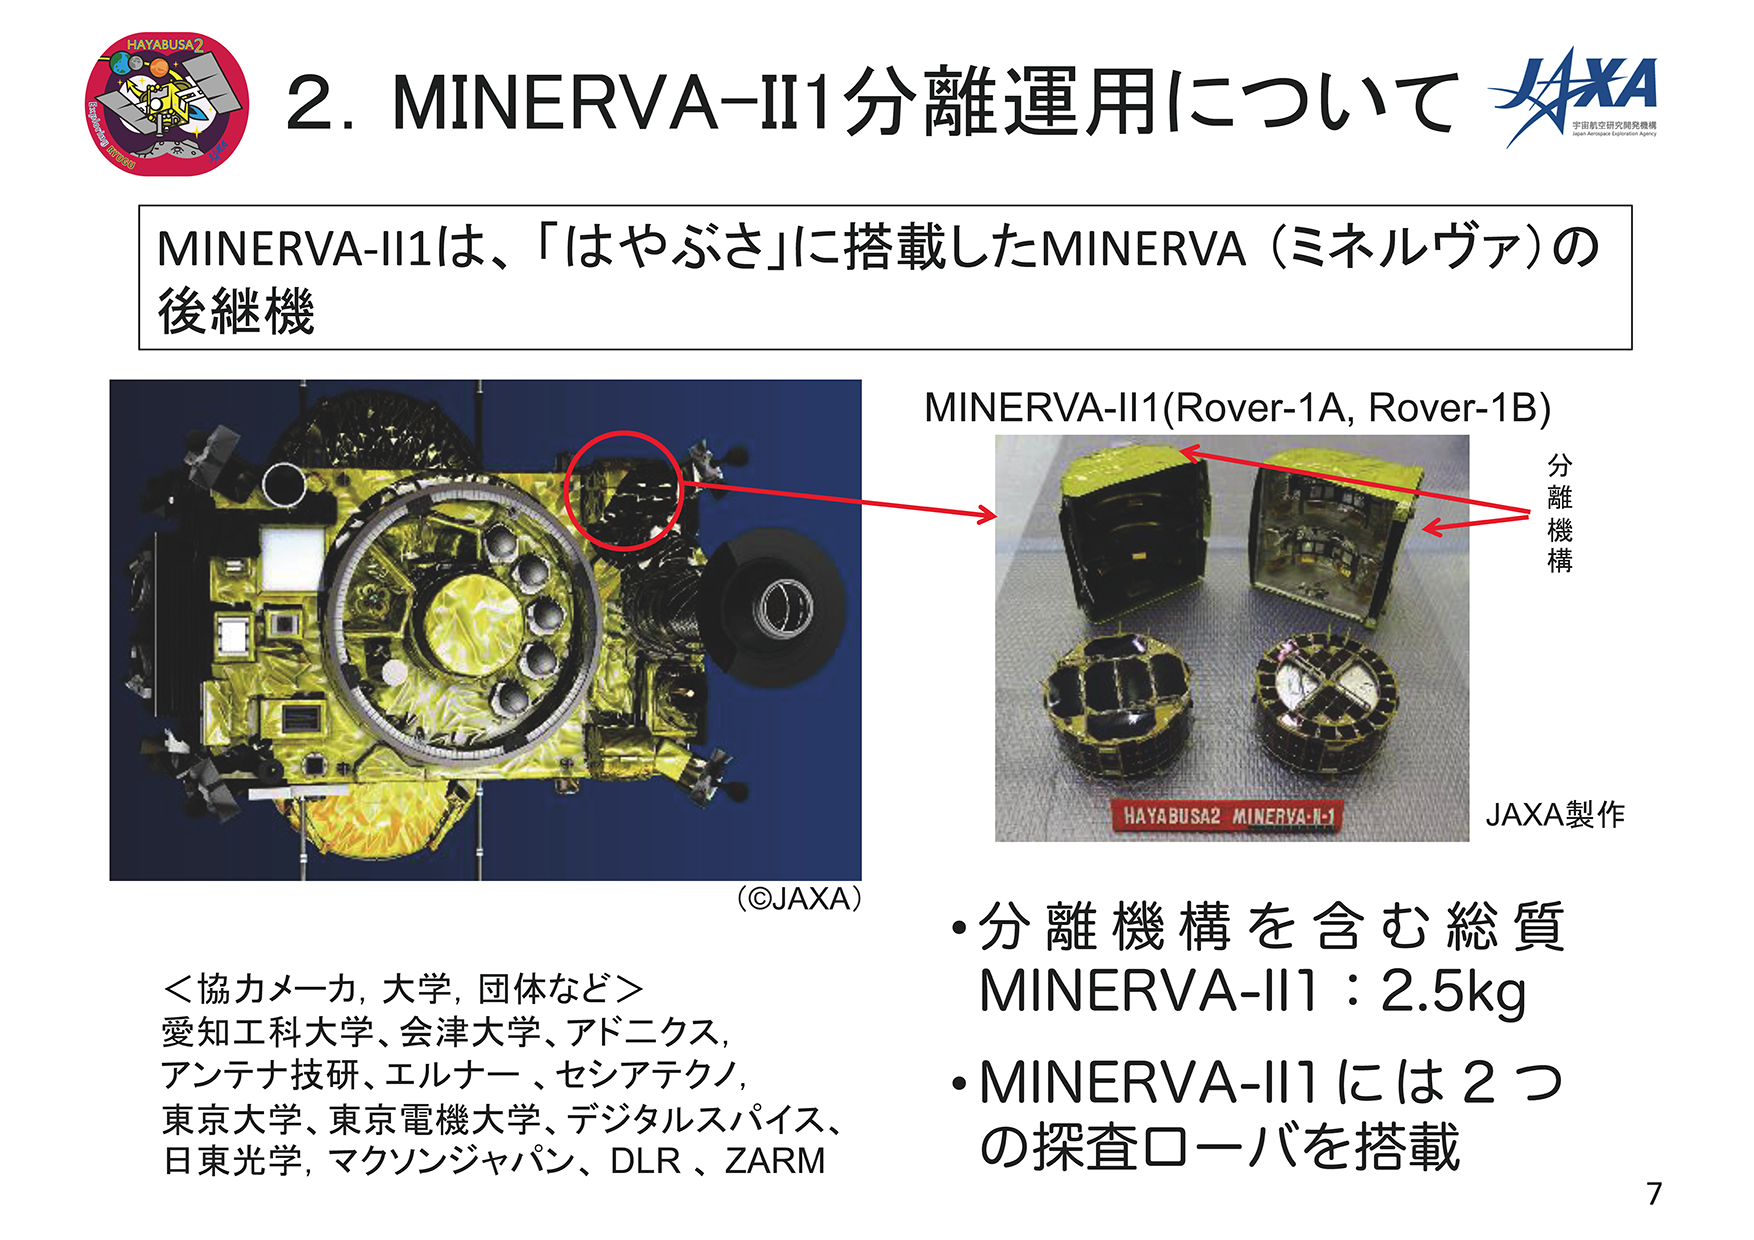 f:id:Imamura:20180921145457p:plain